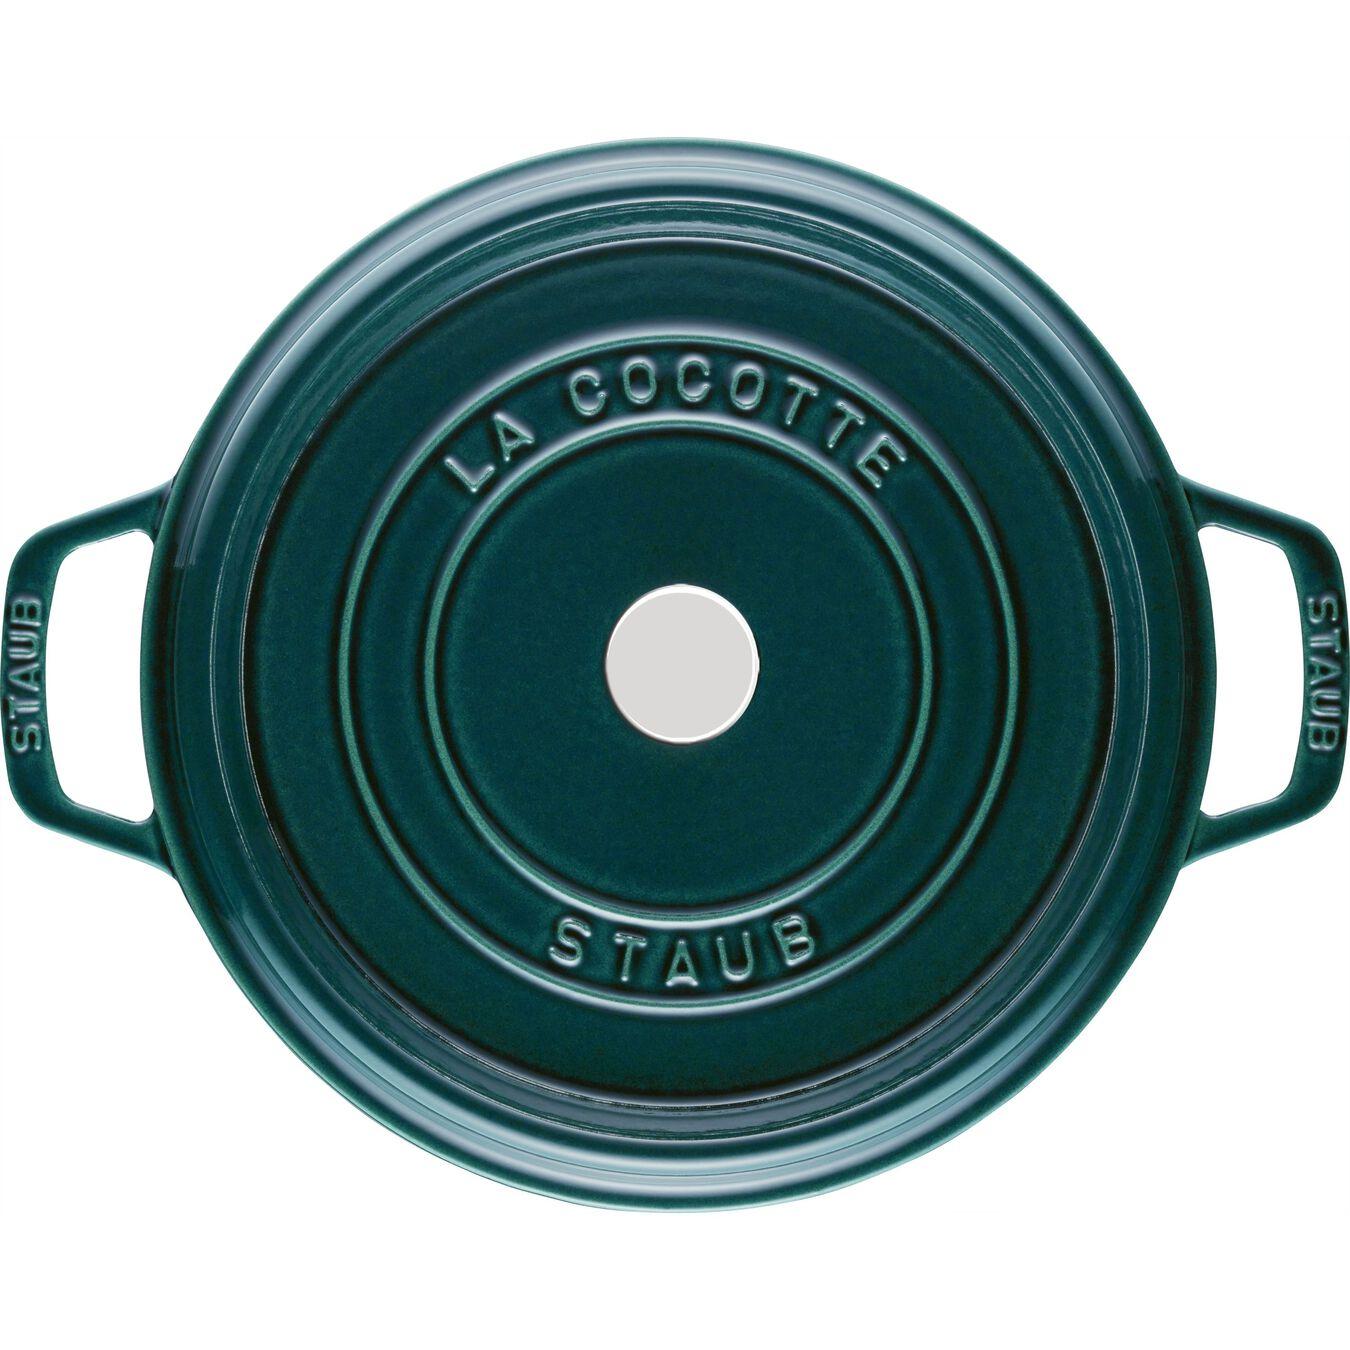 Cocotte 26 cm, rund, La-Mer, Gusseisen,,large 3